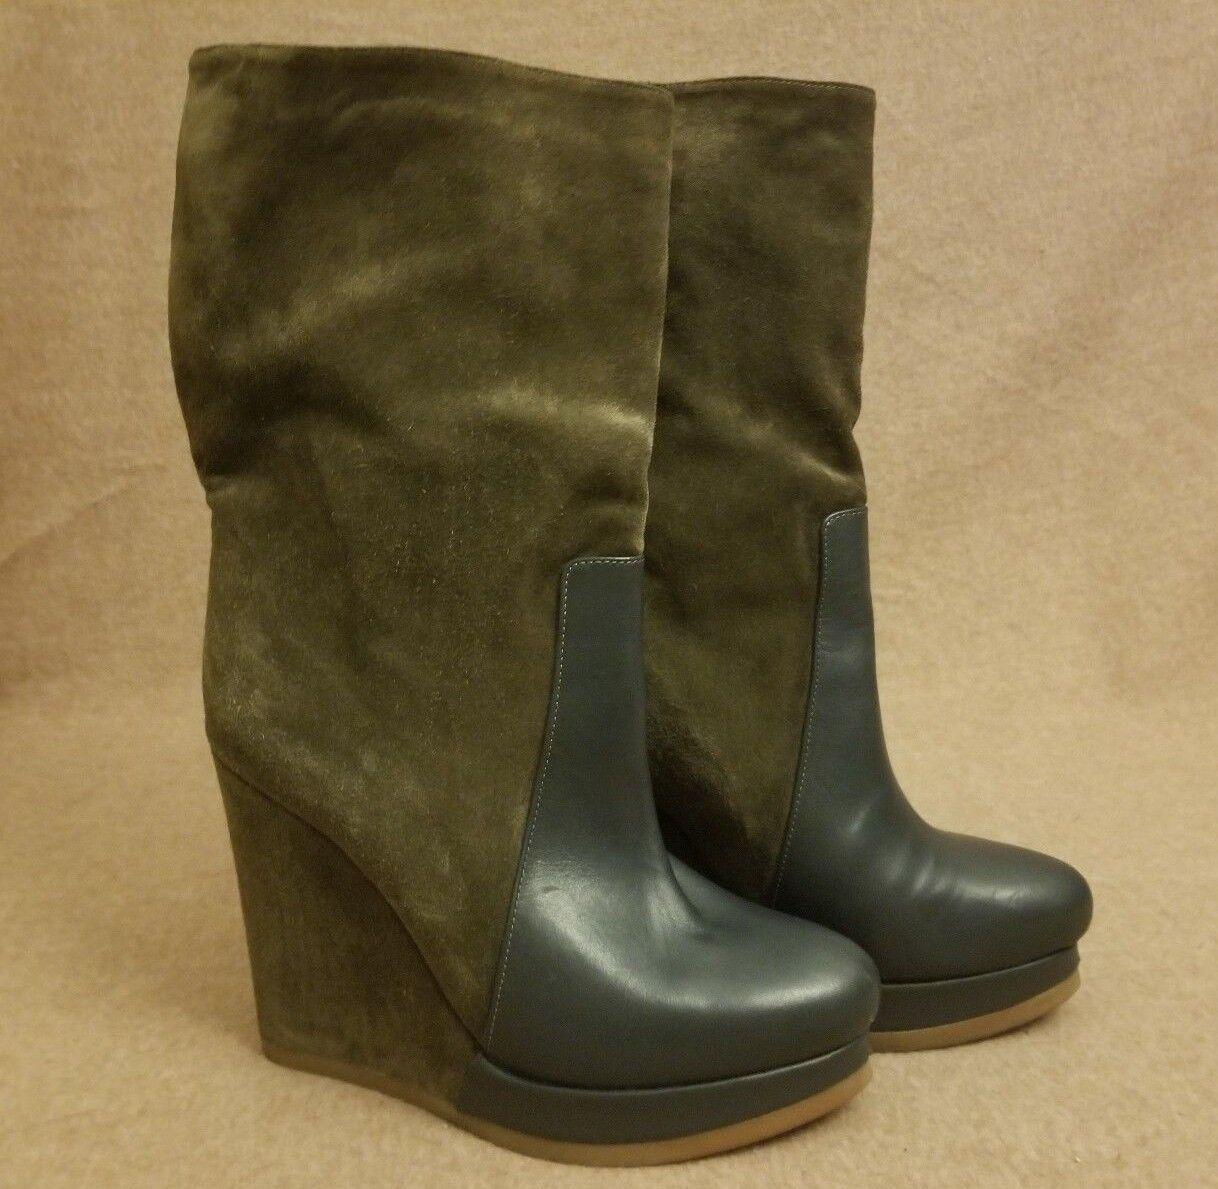 Jil Sander Women Olive Leather Suede Tall Platform Wedge High Heel Boots Size 39